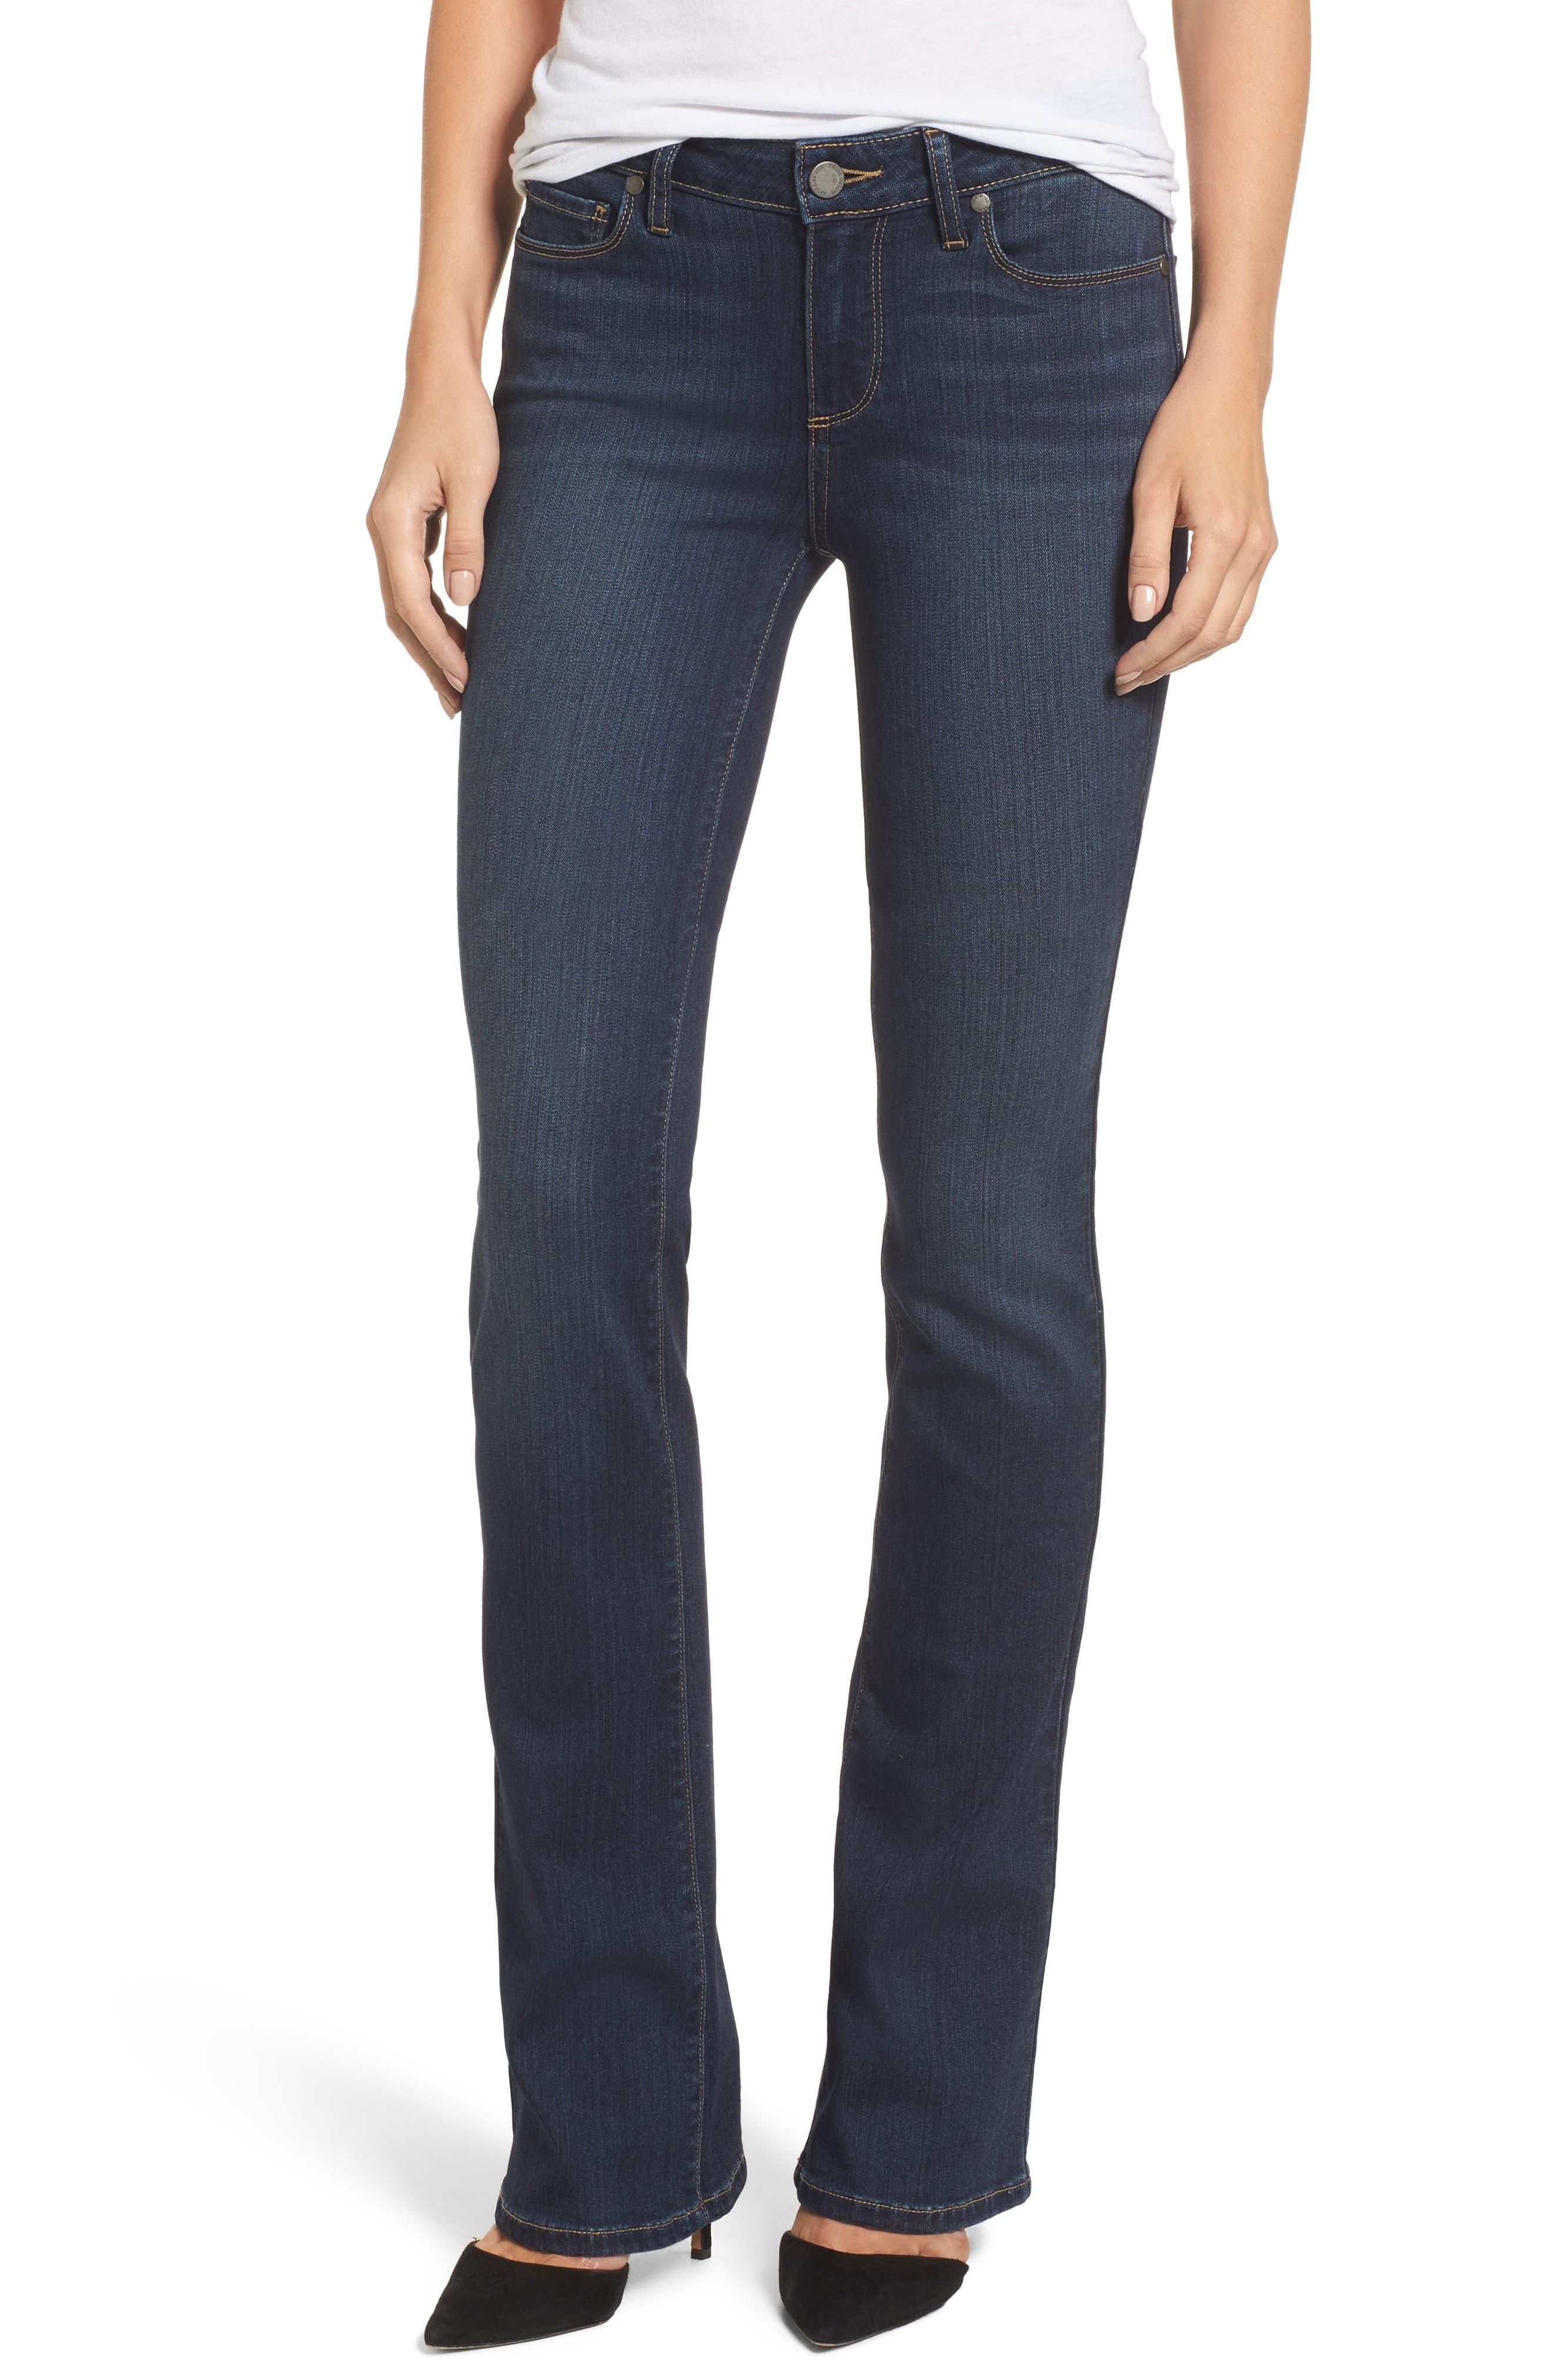 Women's Paige Transcend - Manhattan Bootcut Jeans